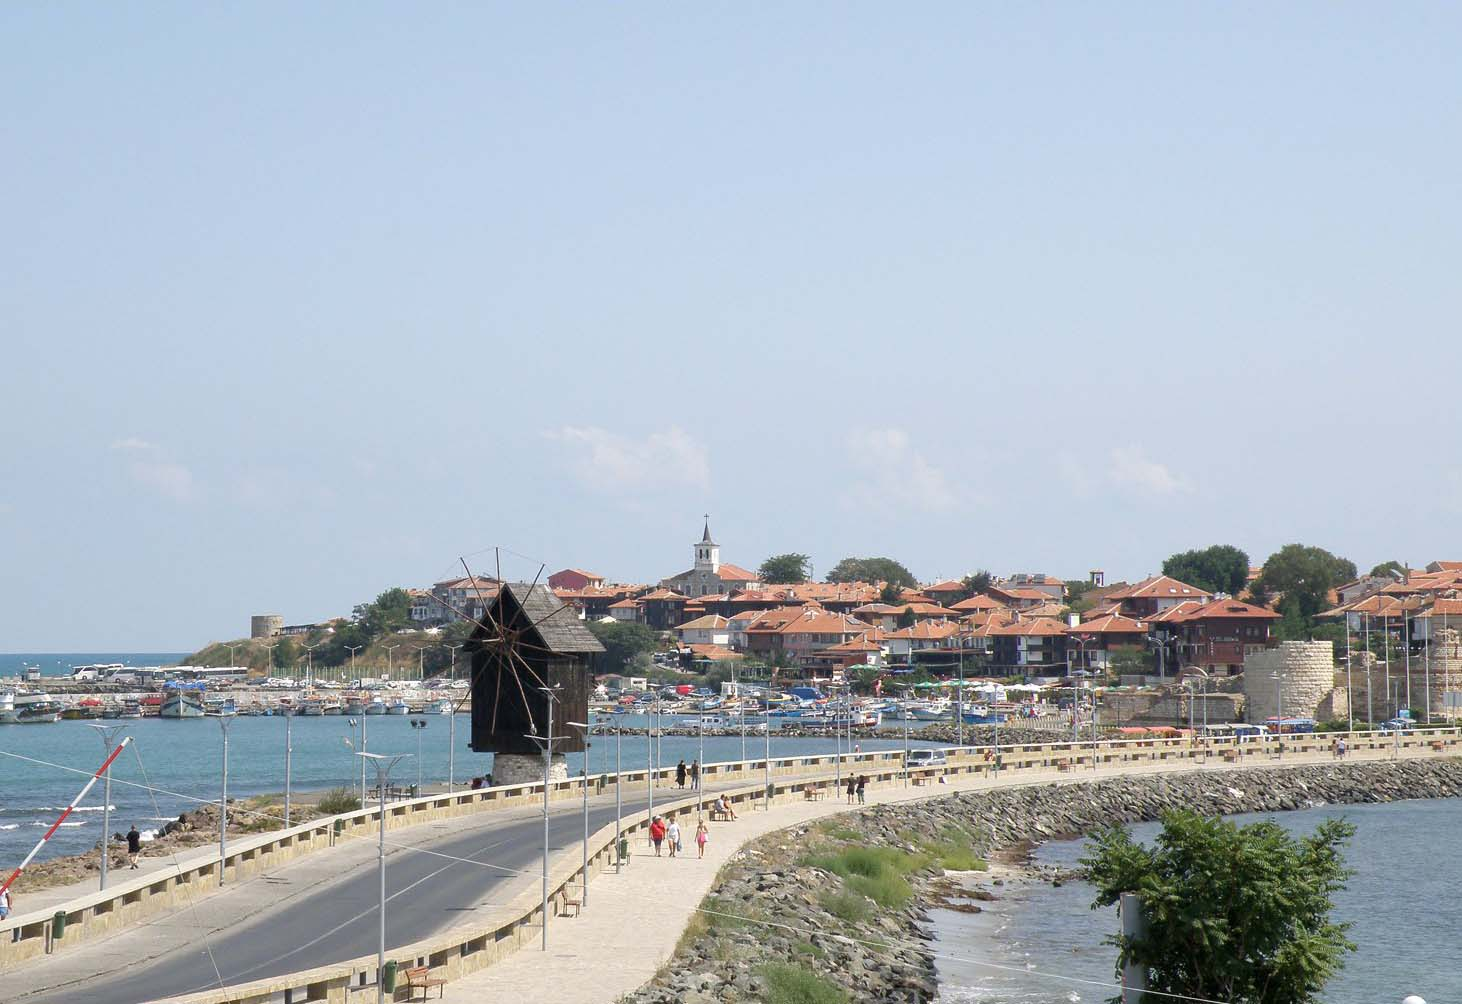 nessebar-an-ancient-Christian-city-a-great-resort-place